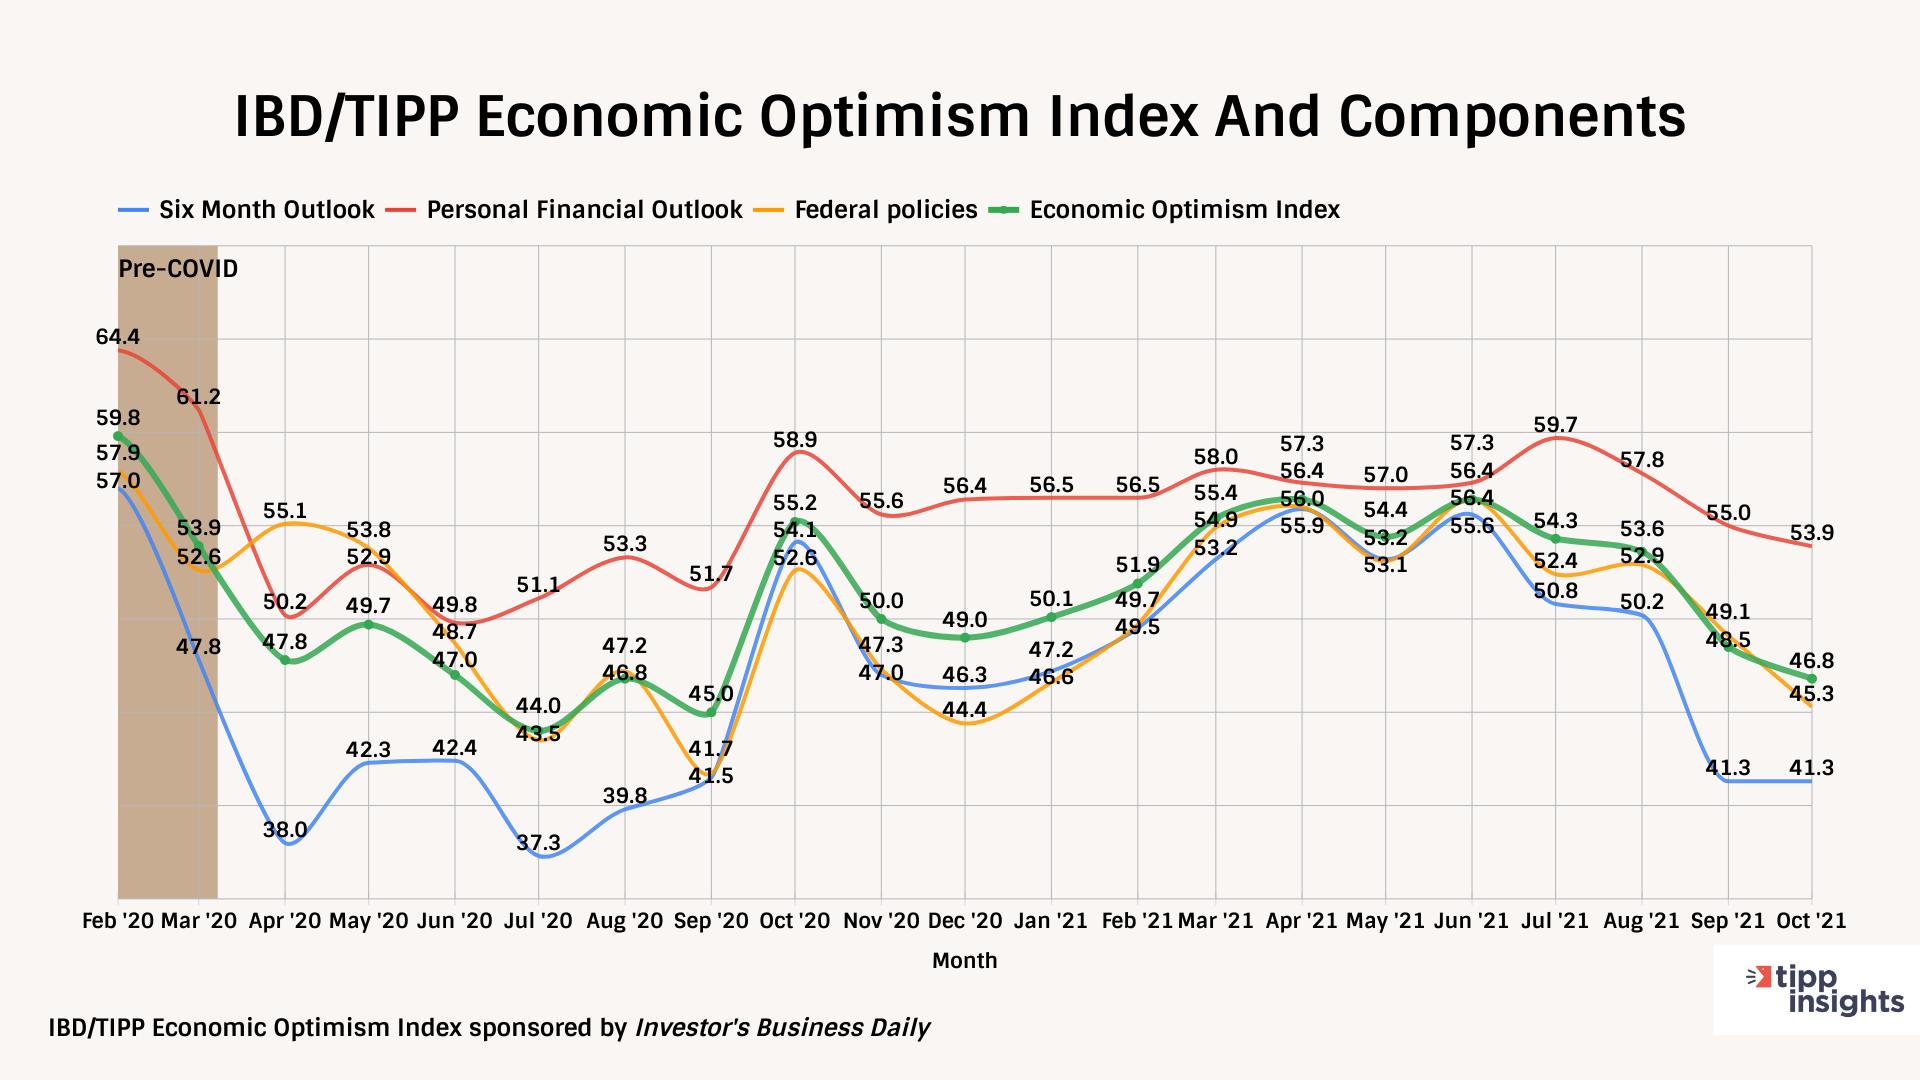 IBD/TIPP Economic Optimism Tracking chart February 2020-October 2021